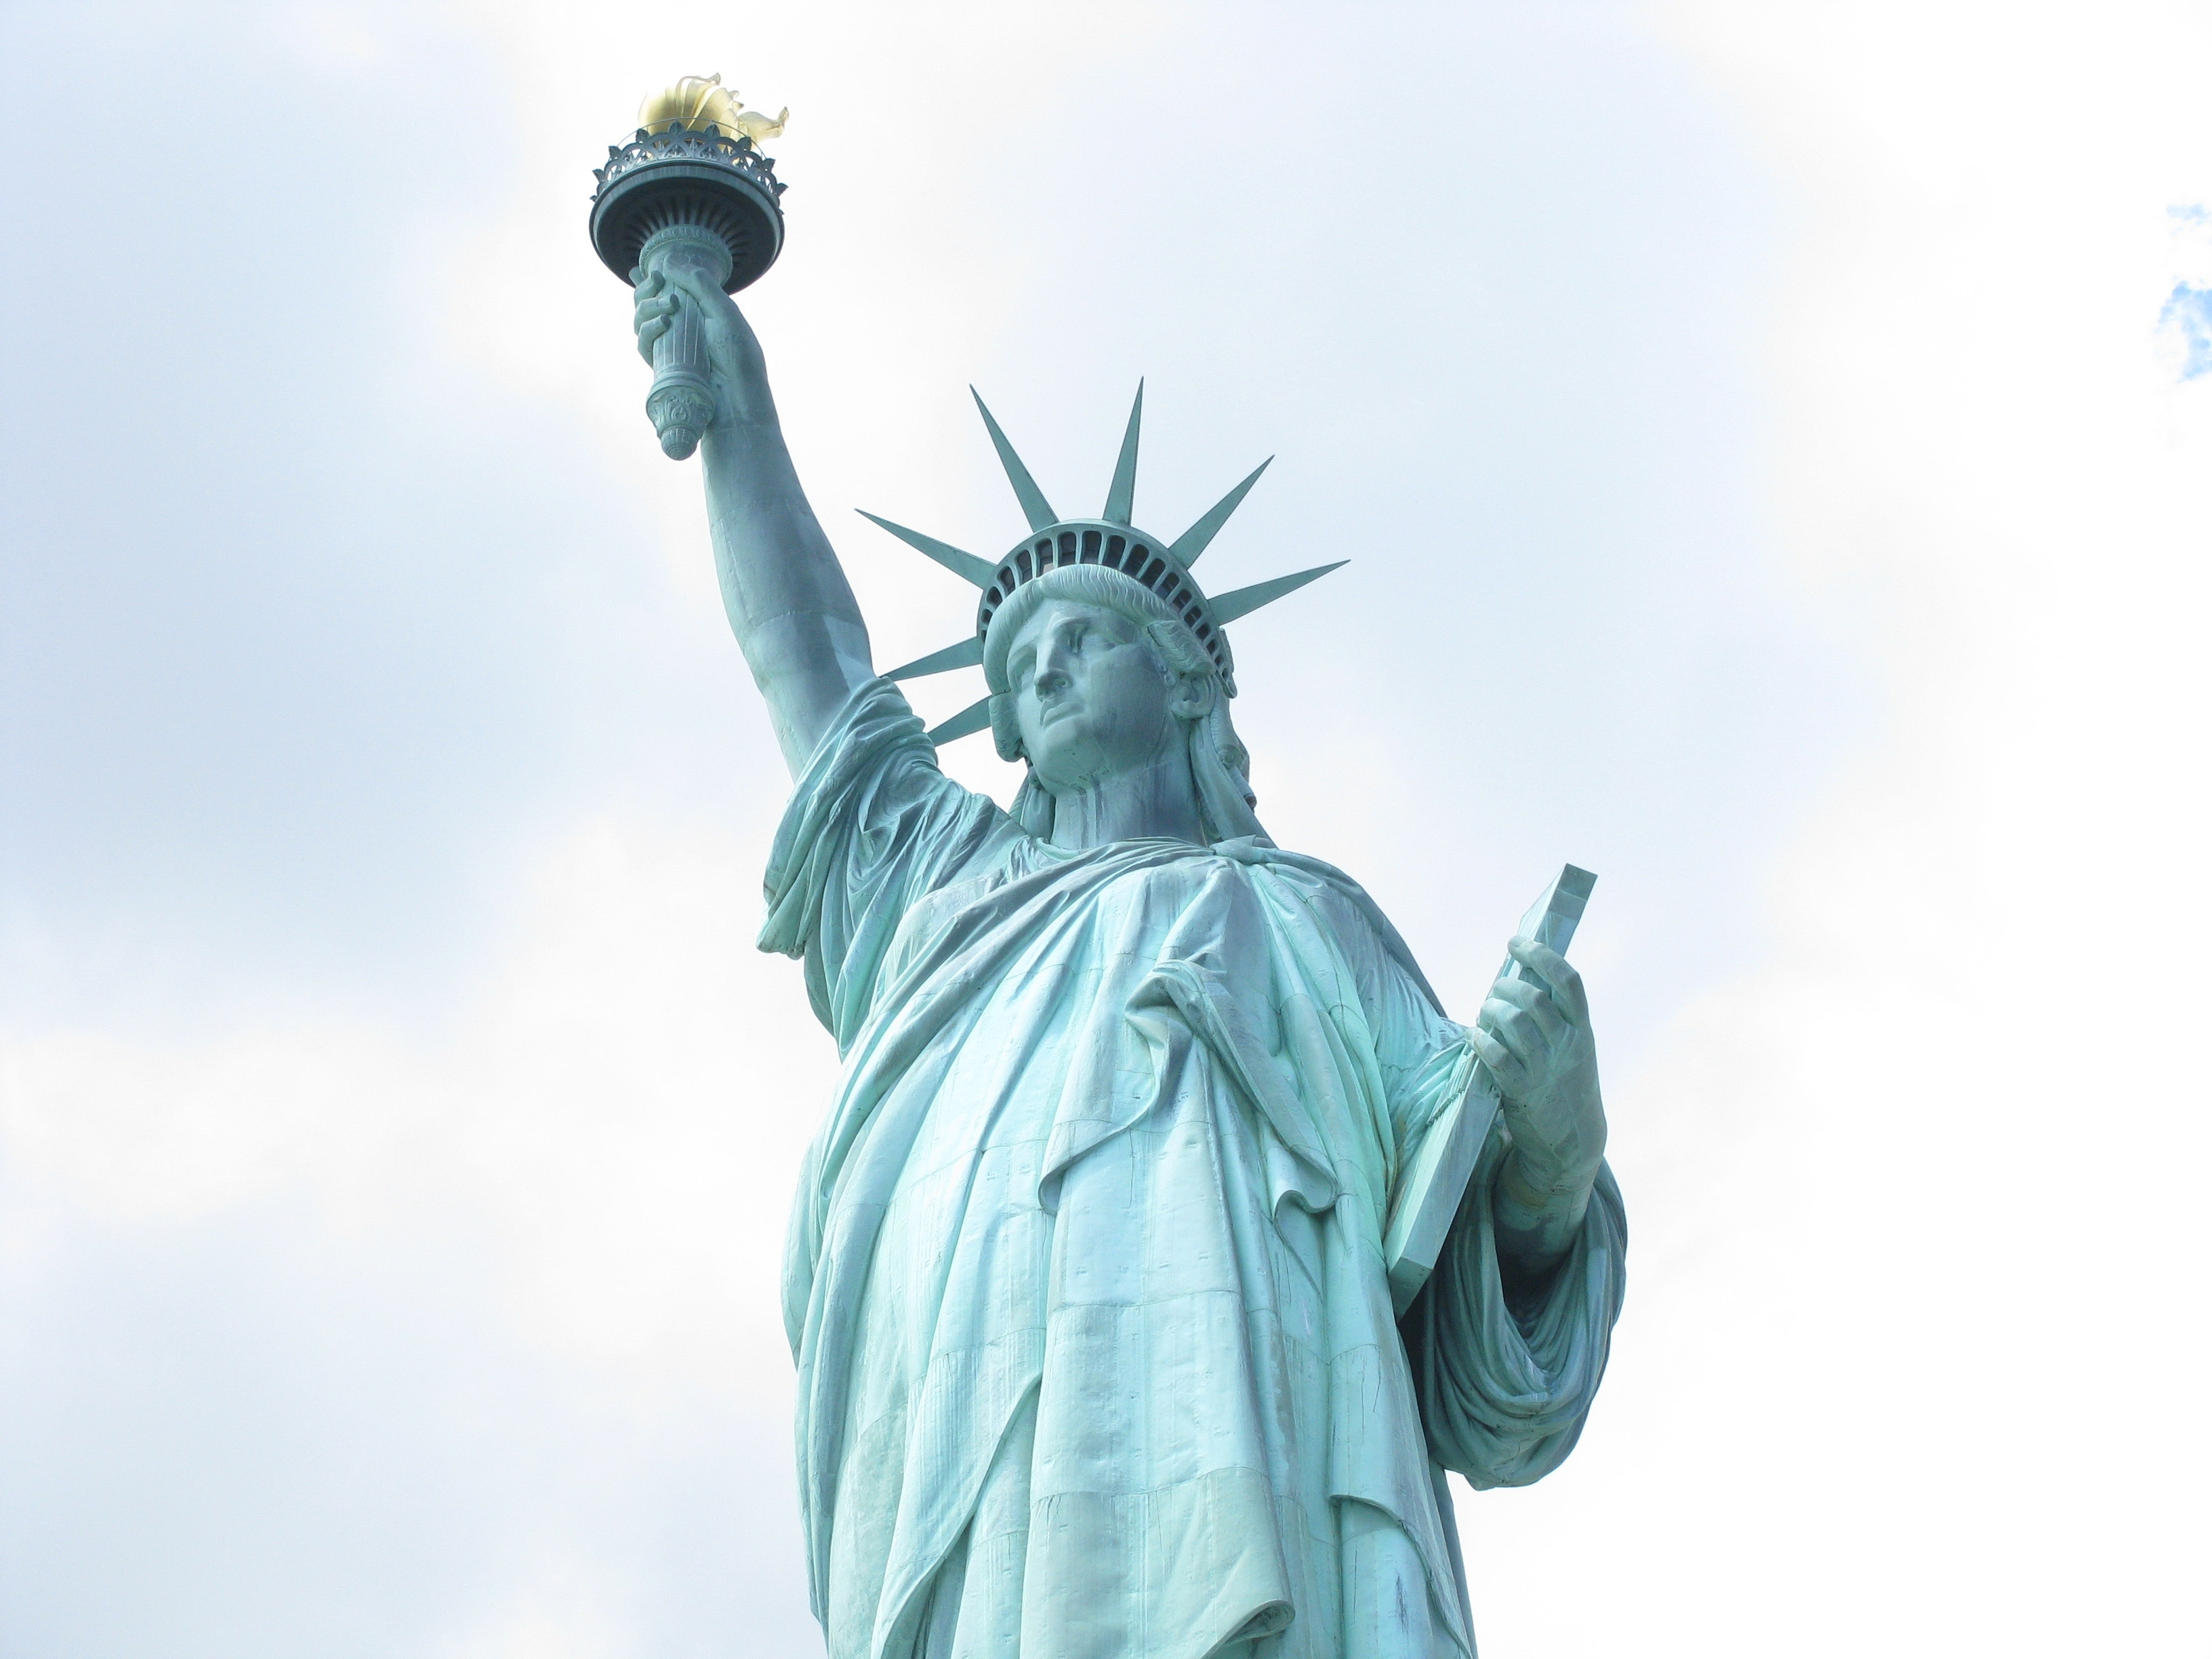 Statue Of Liberty 183 Free Stock Photo